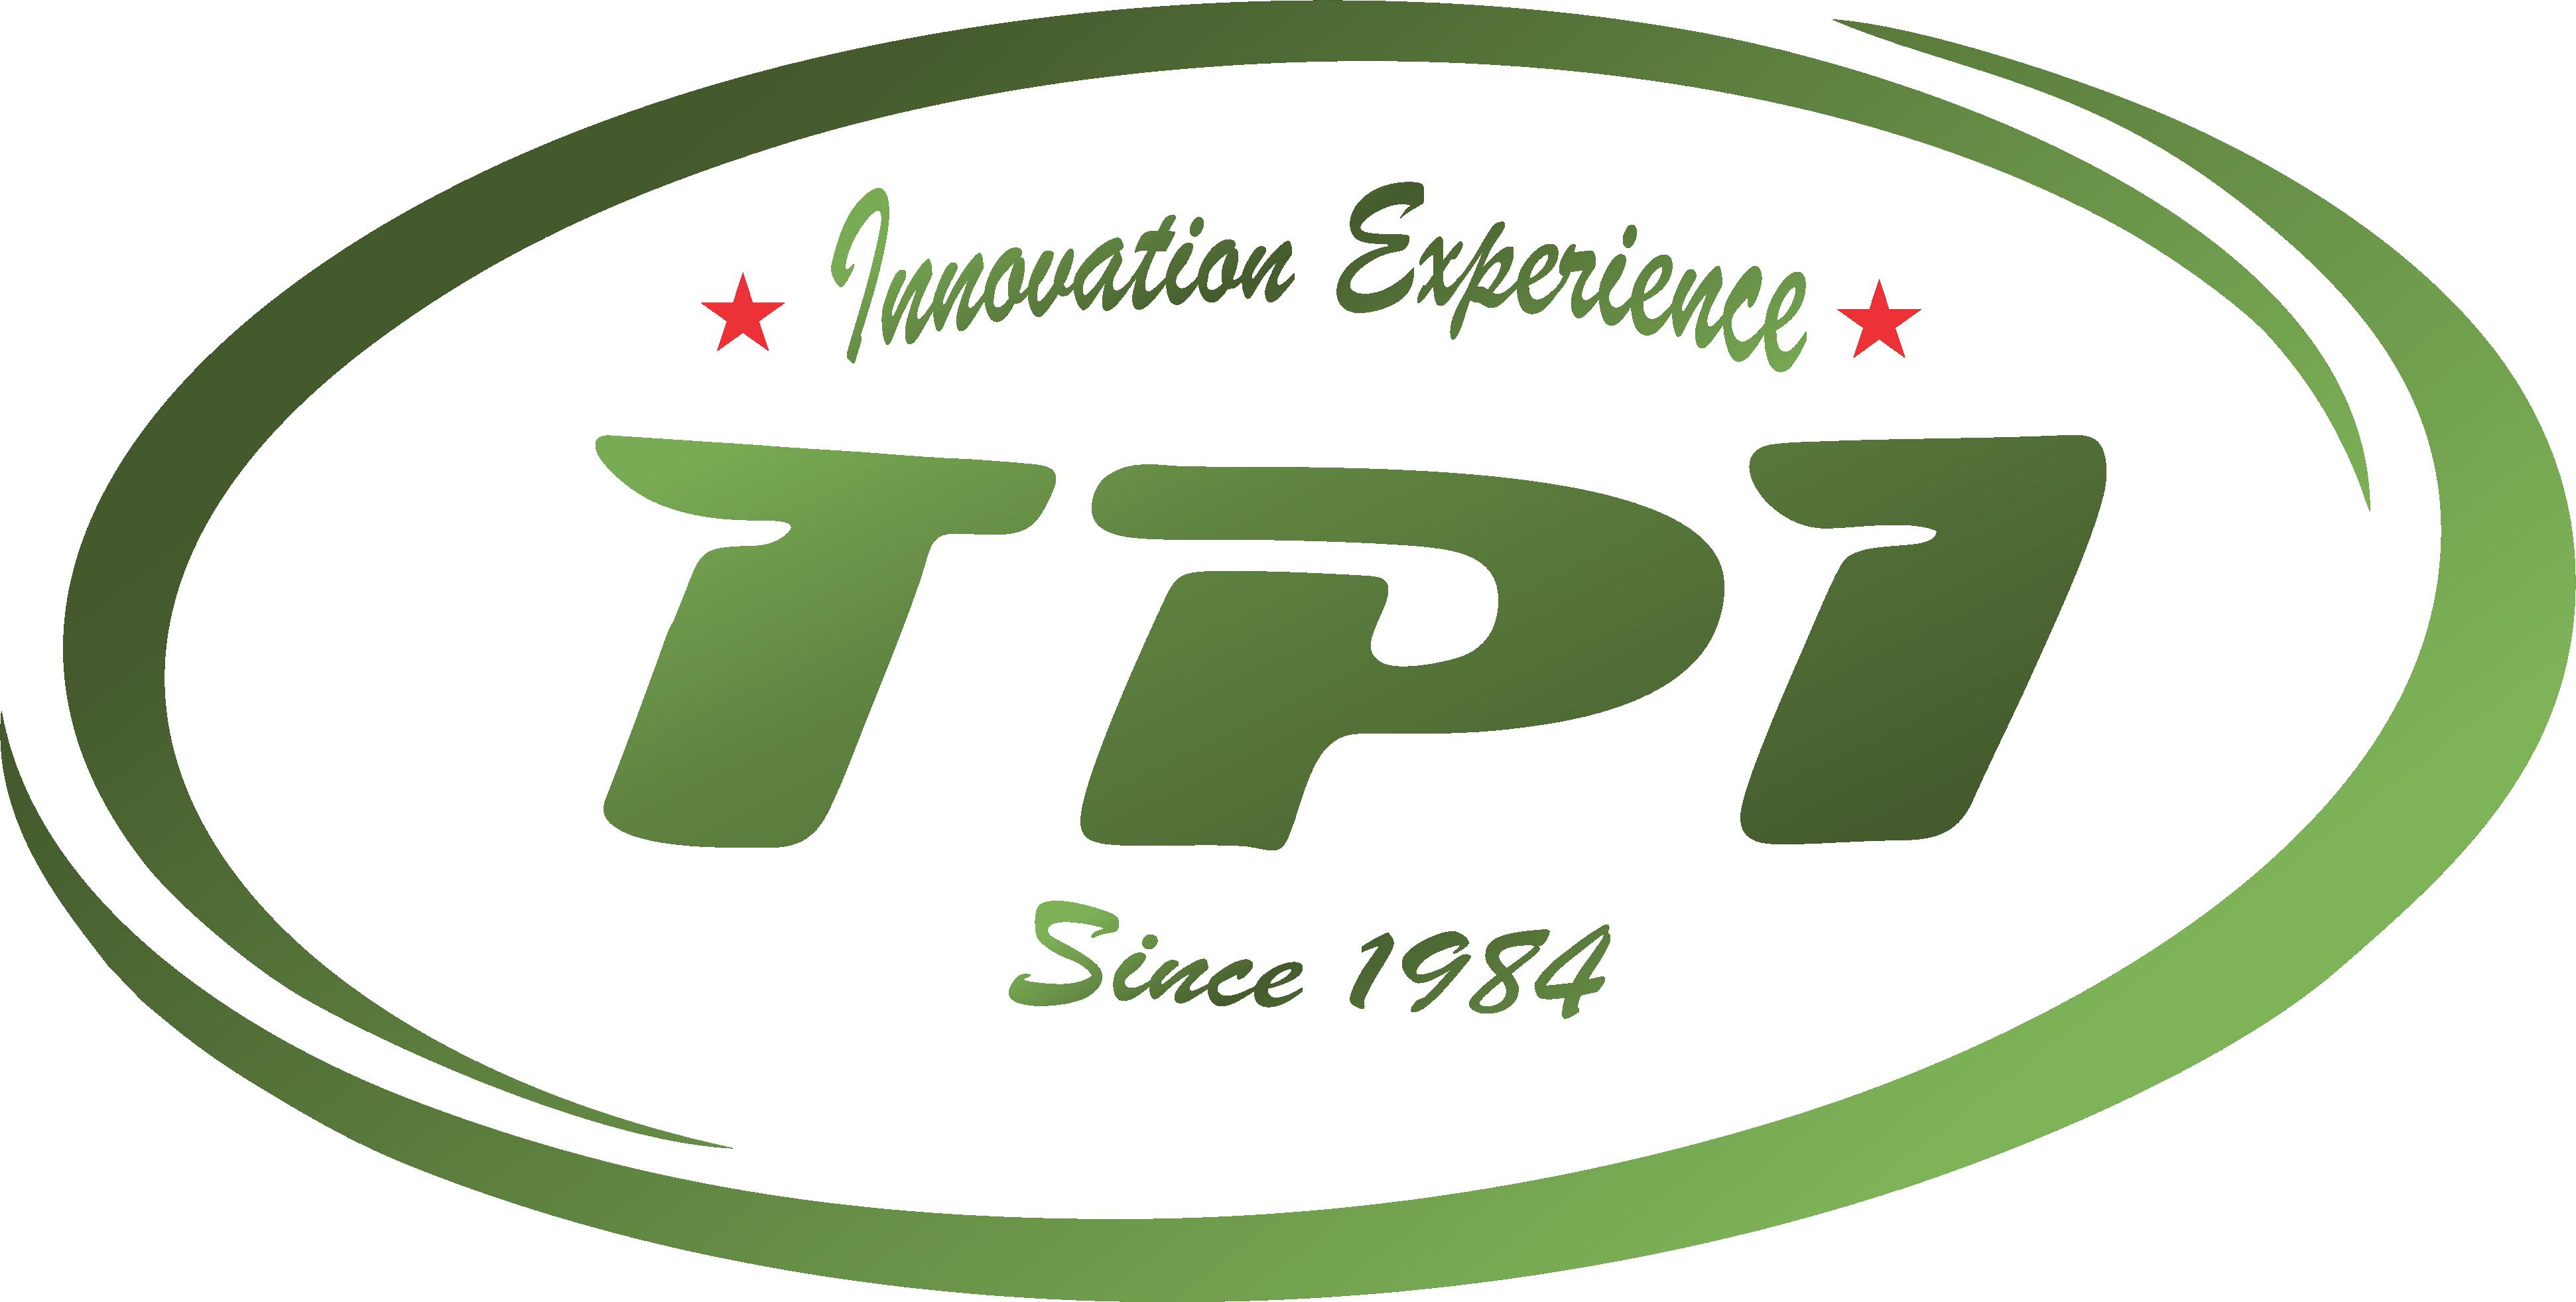 http://www.trichyplasticindustries.com/Trichy Plastic Industries